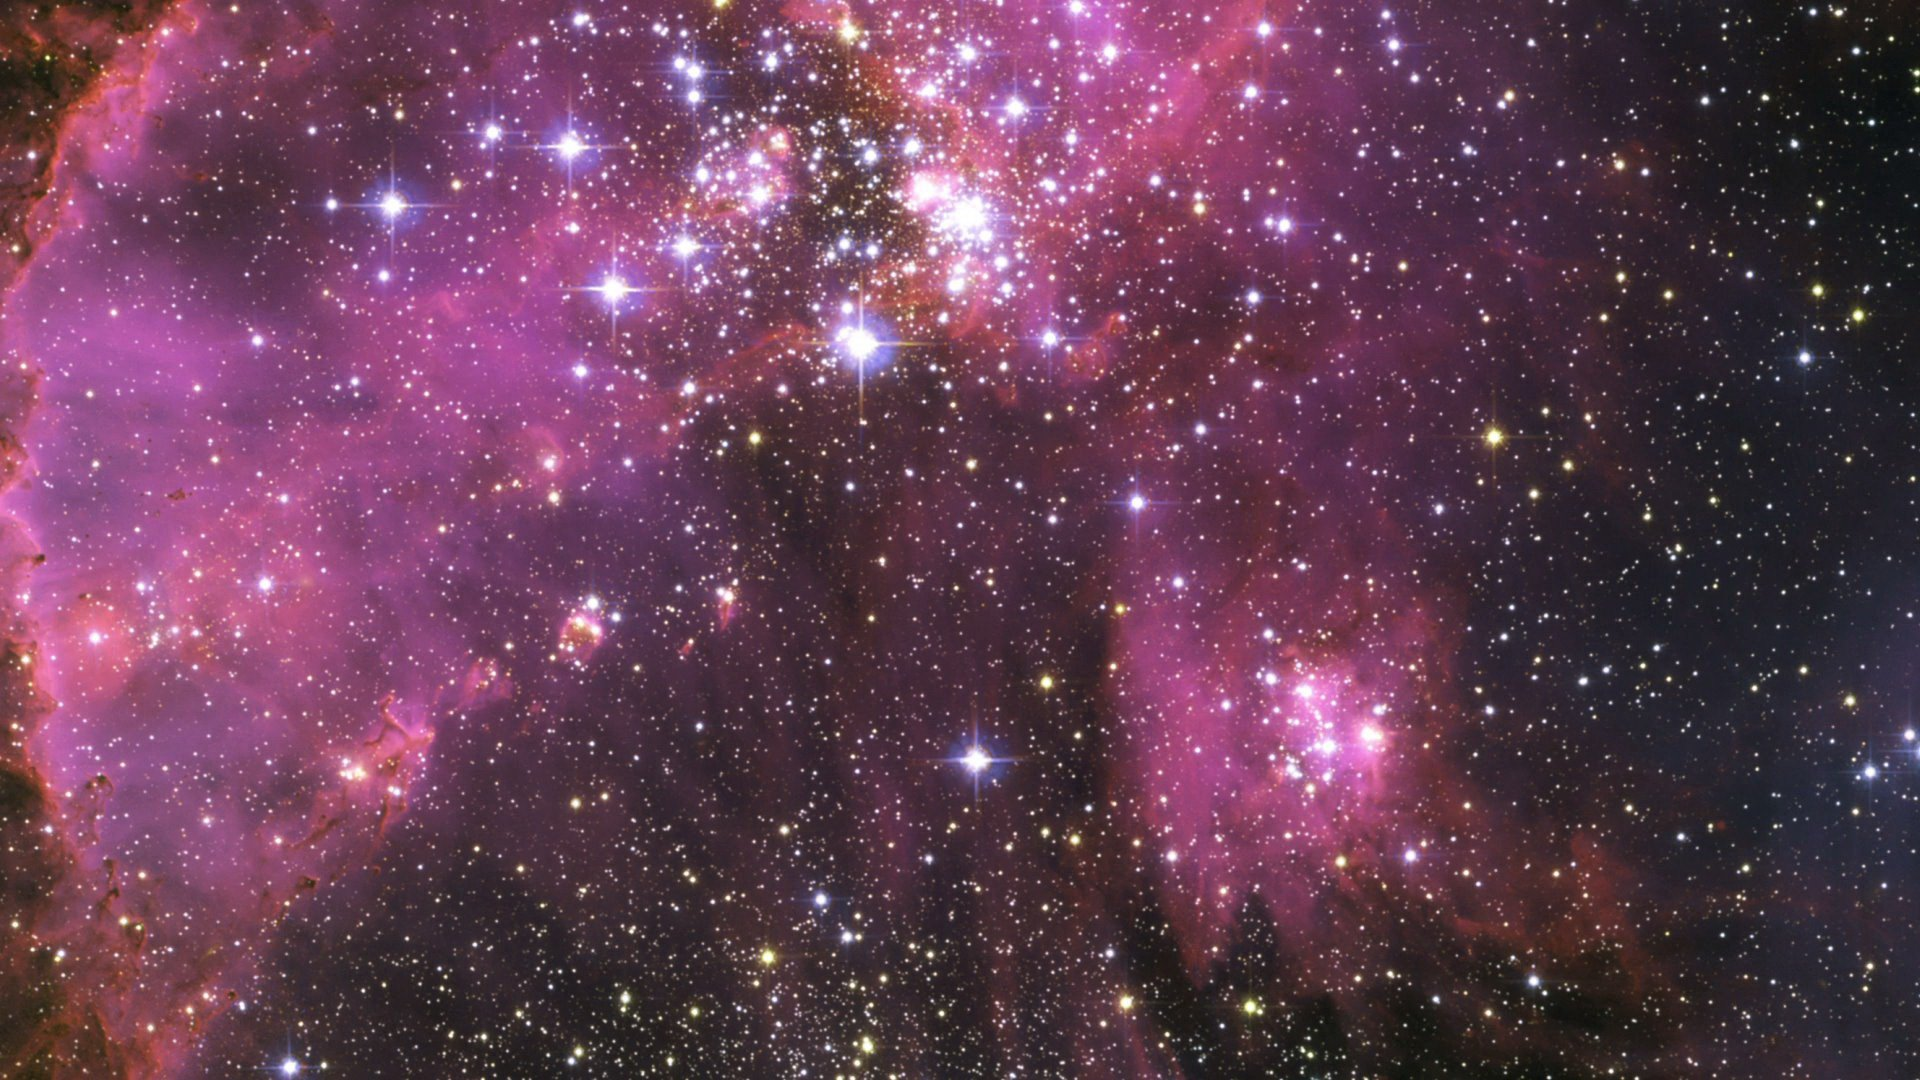 galaxy space purple - photo #12